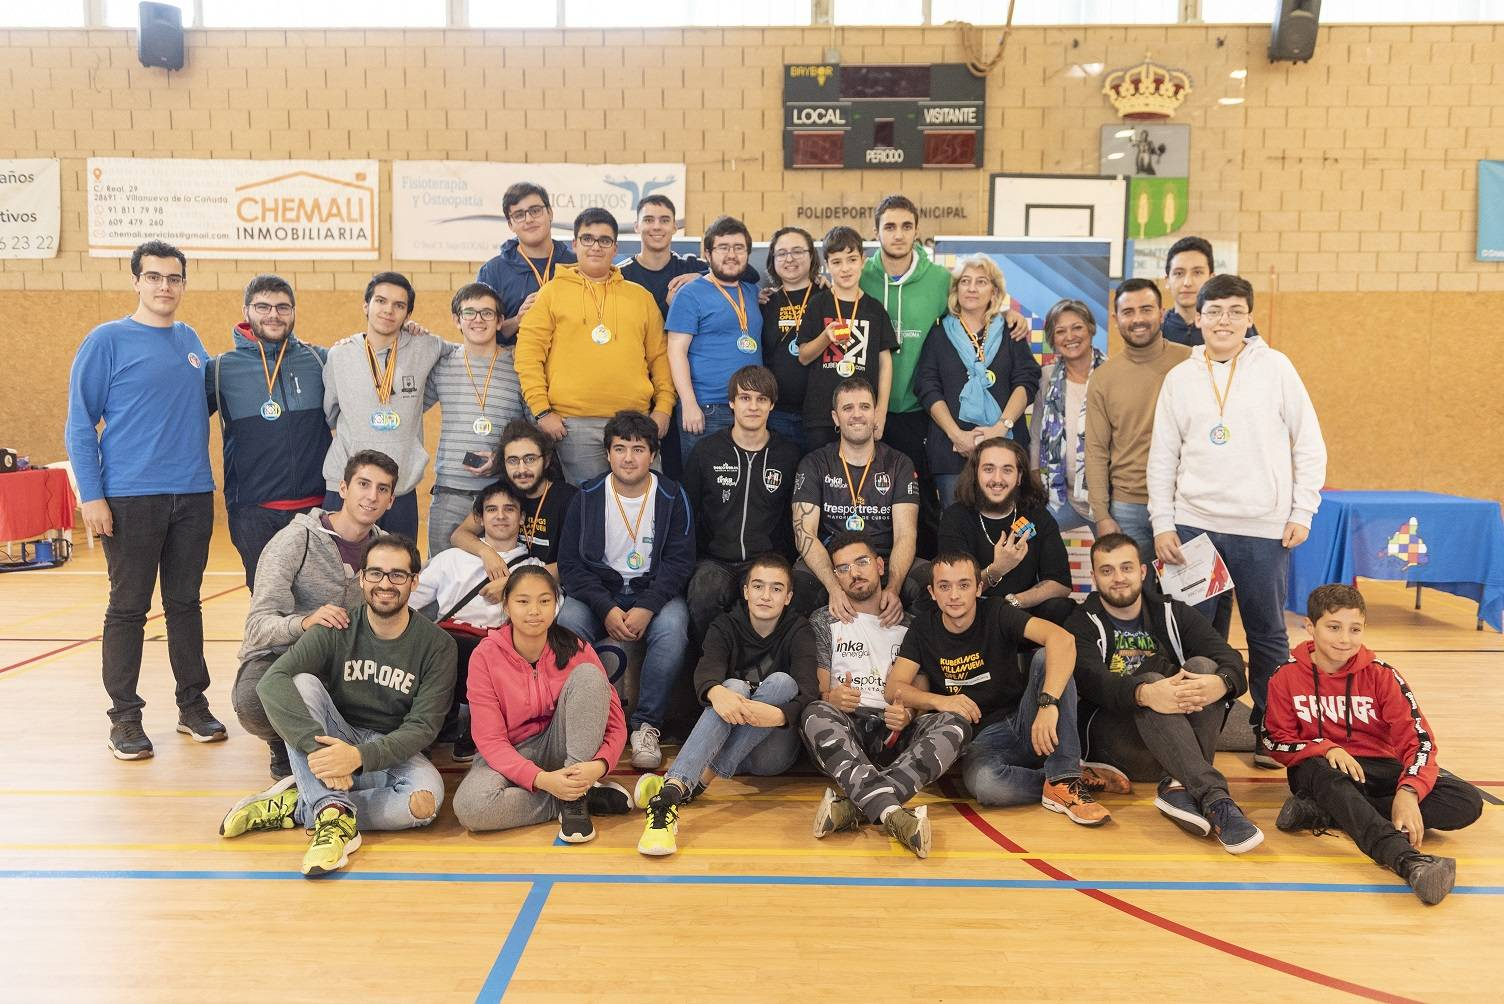 Participantes Campeonato de Rubik